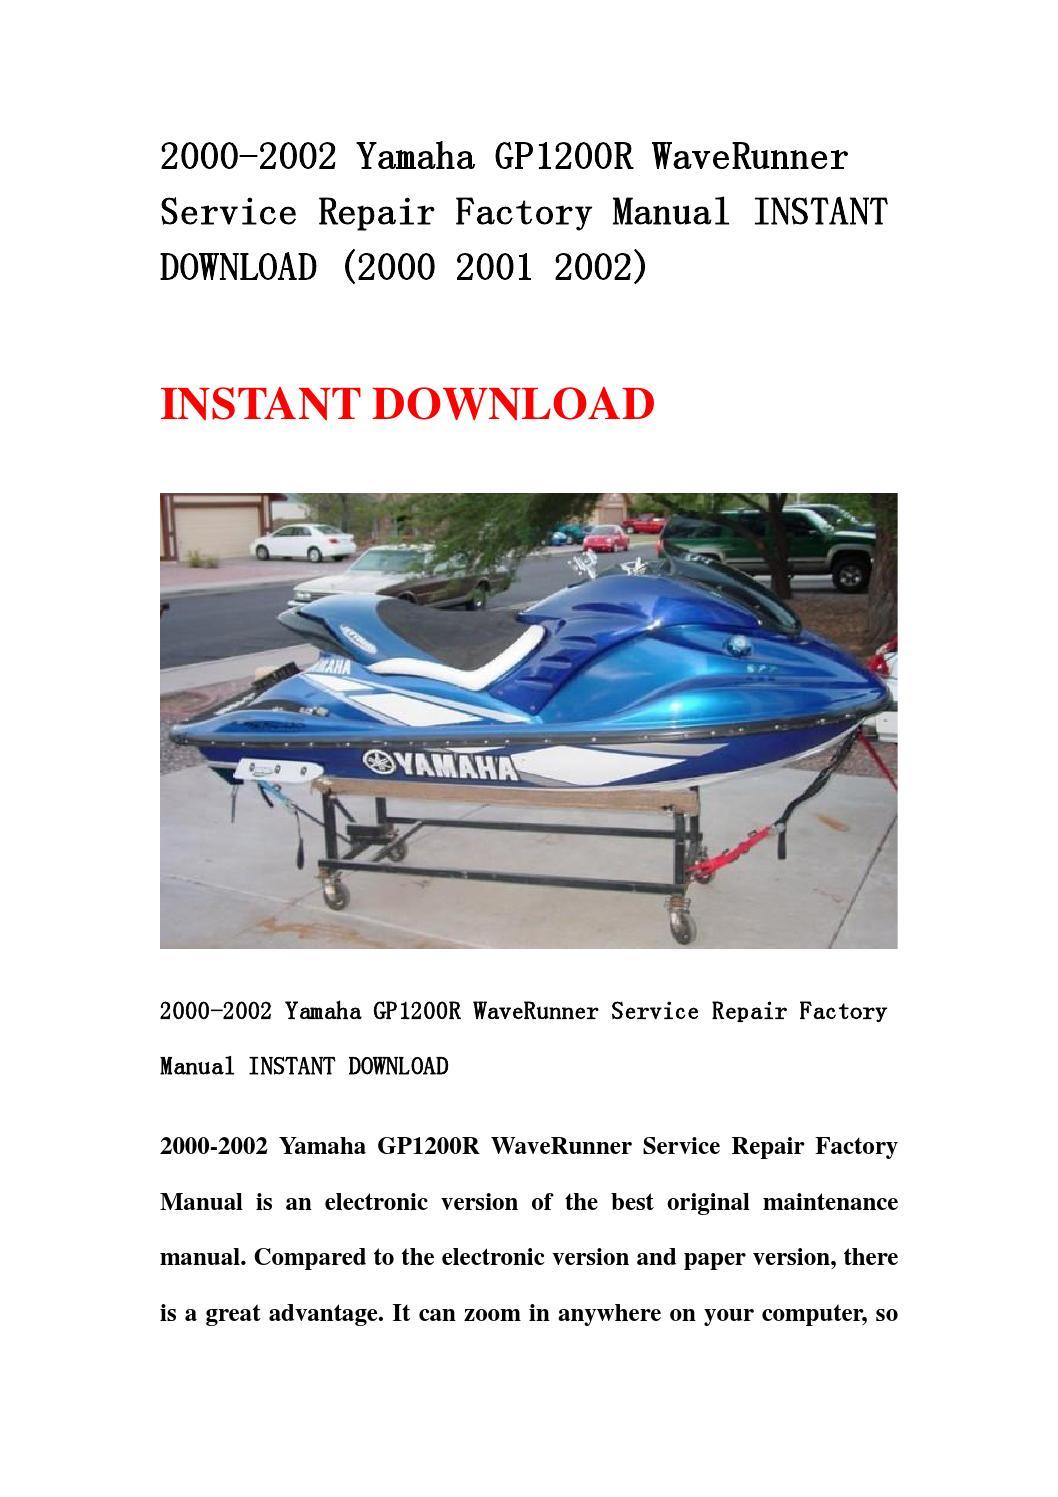 2000 2002 Yamaha Gp1200r Waverunner Service Repair Factory